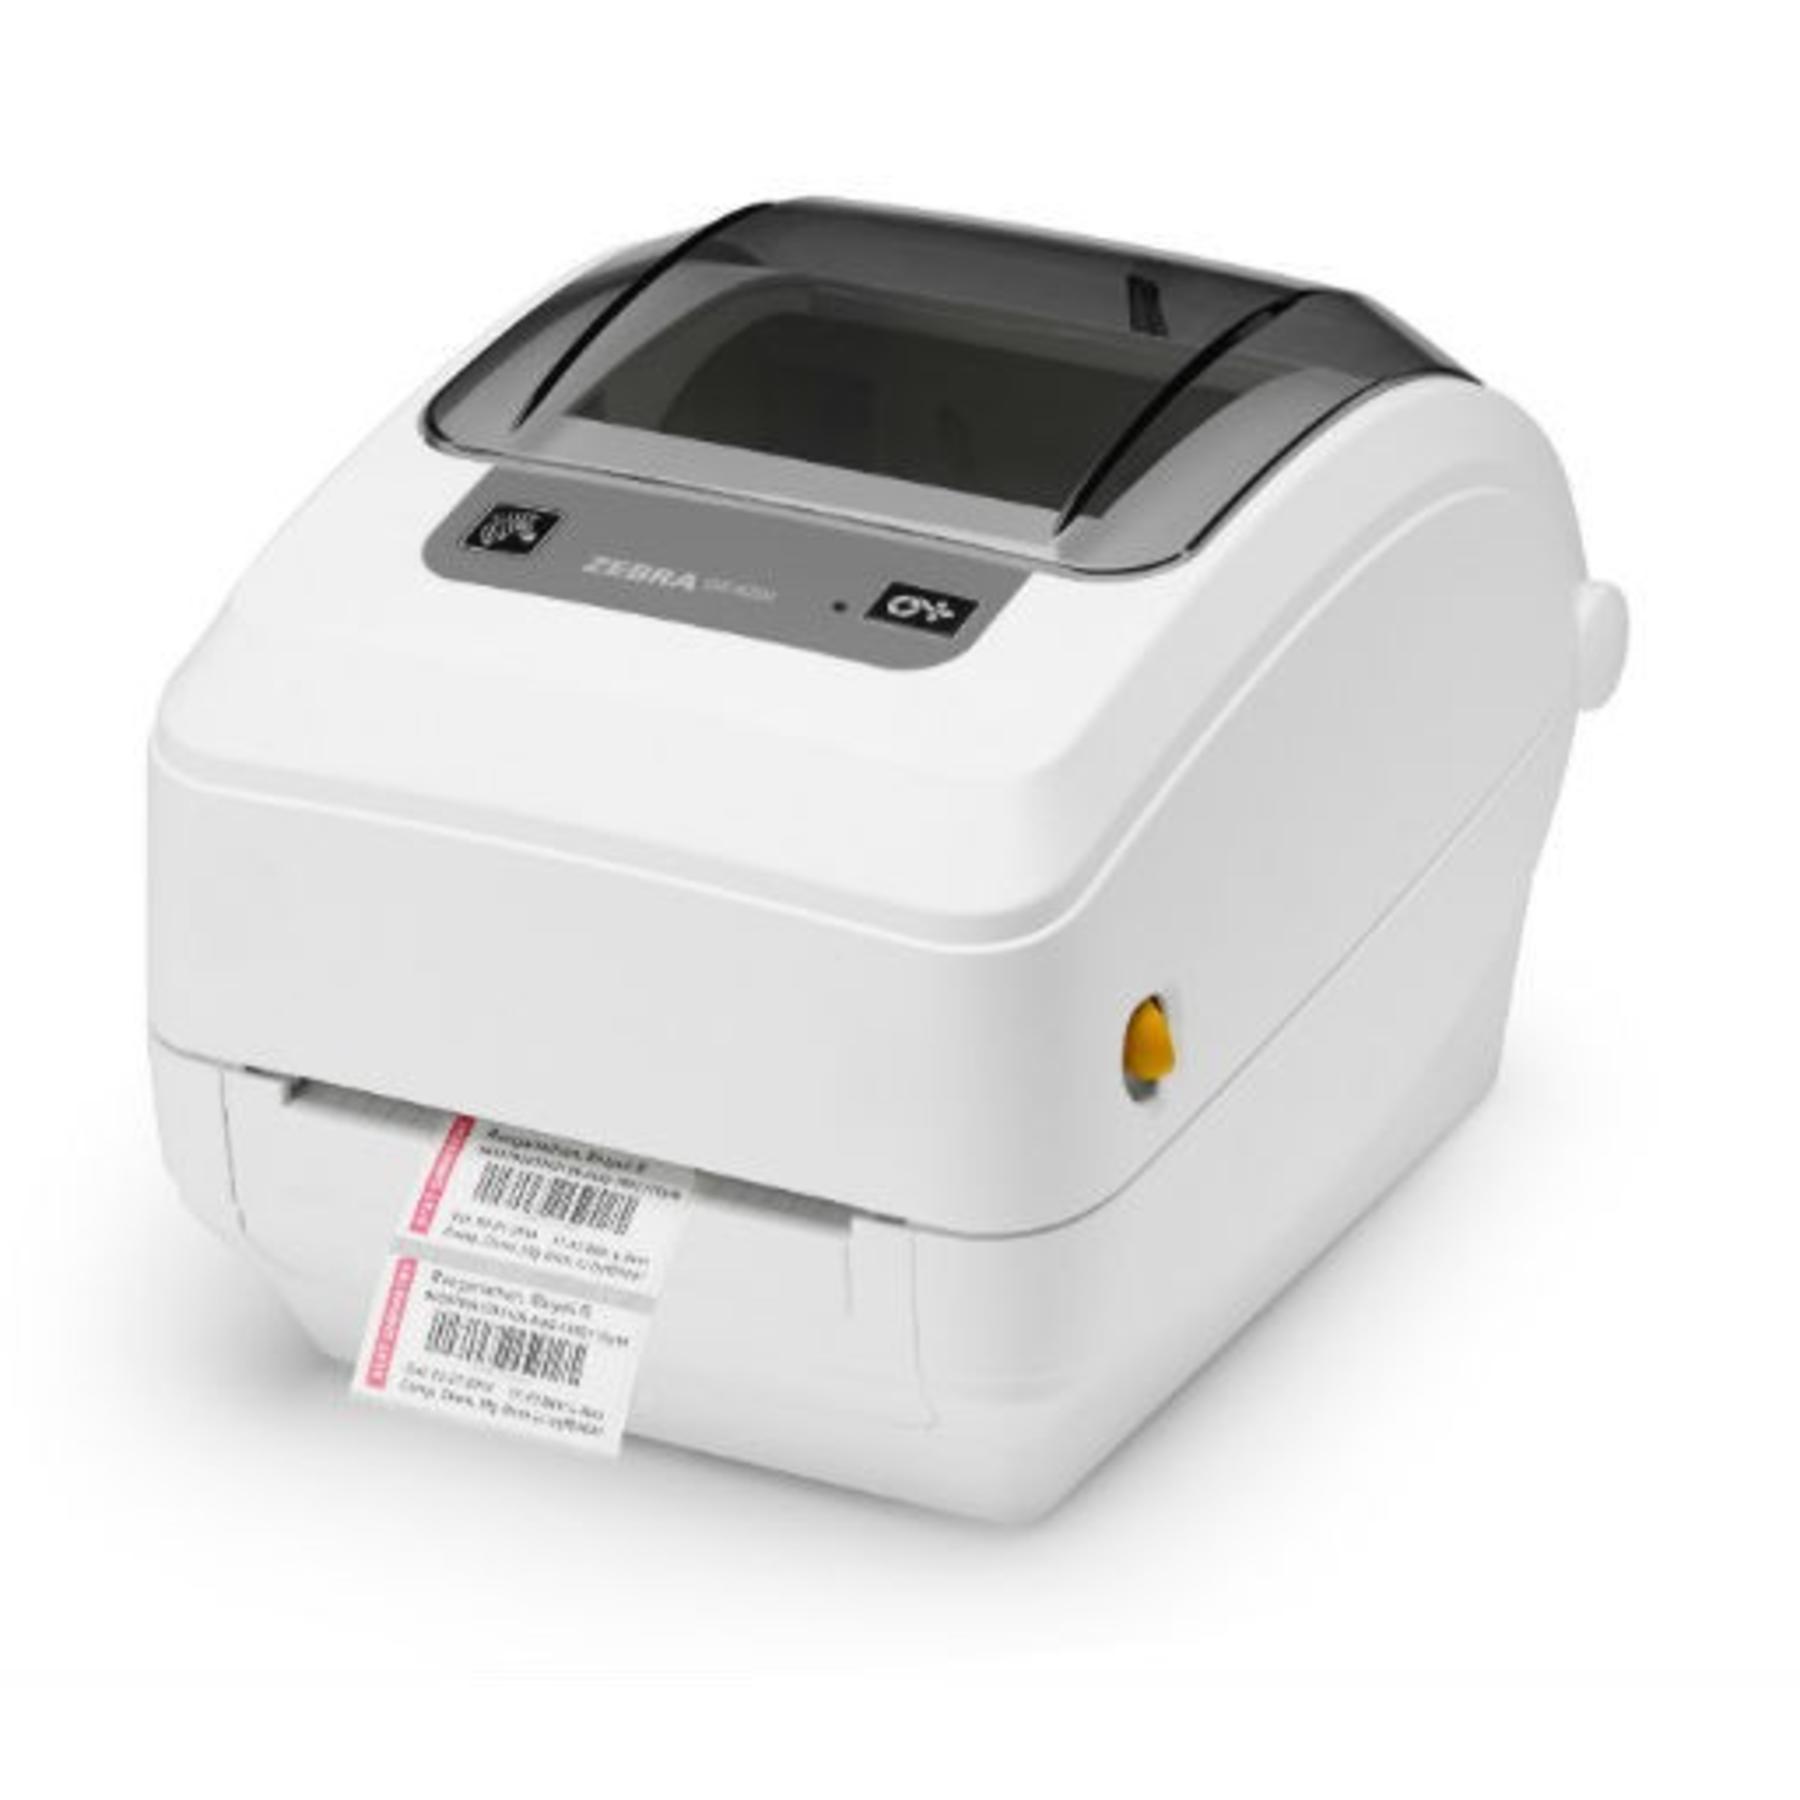 Zebra GK420T-HC Thermal Barcode and Label Printer | Cash ...